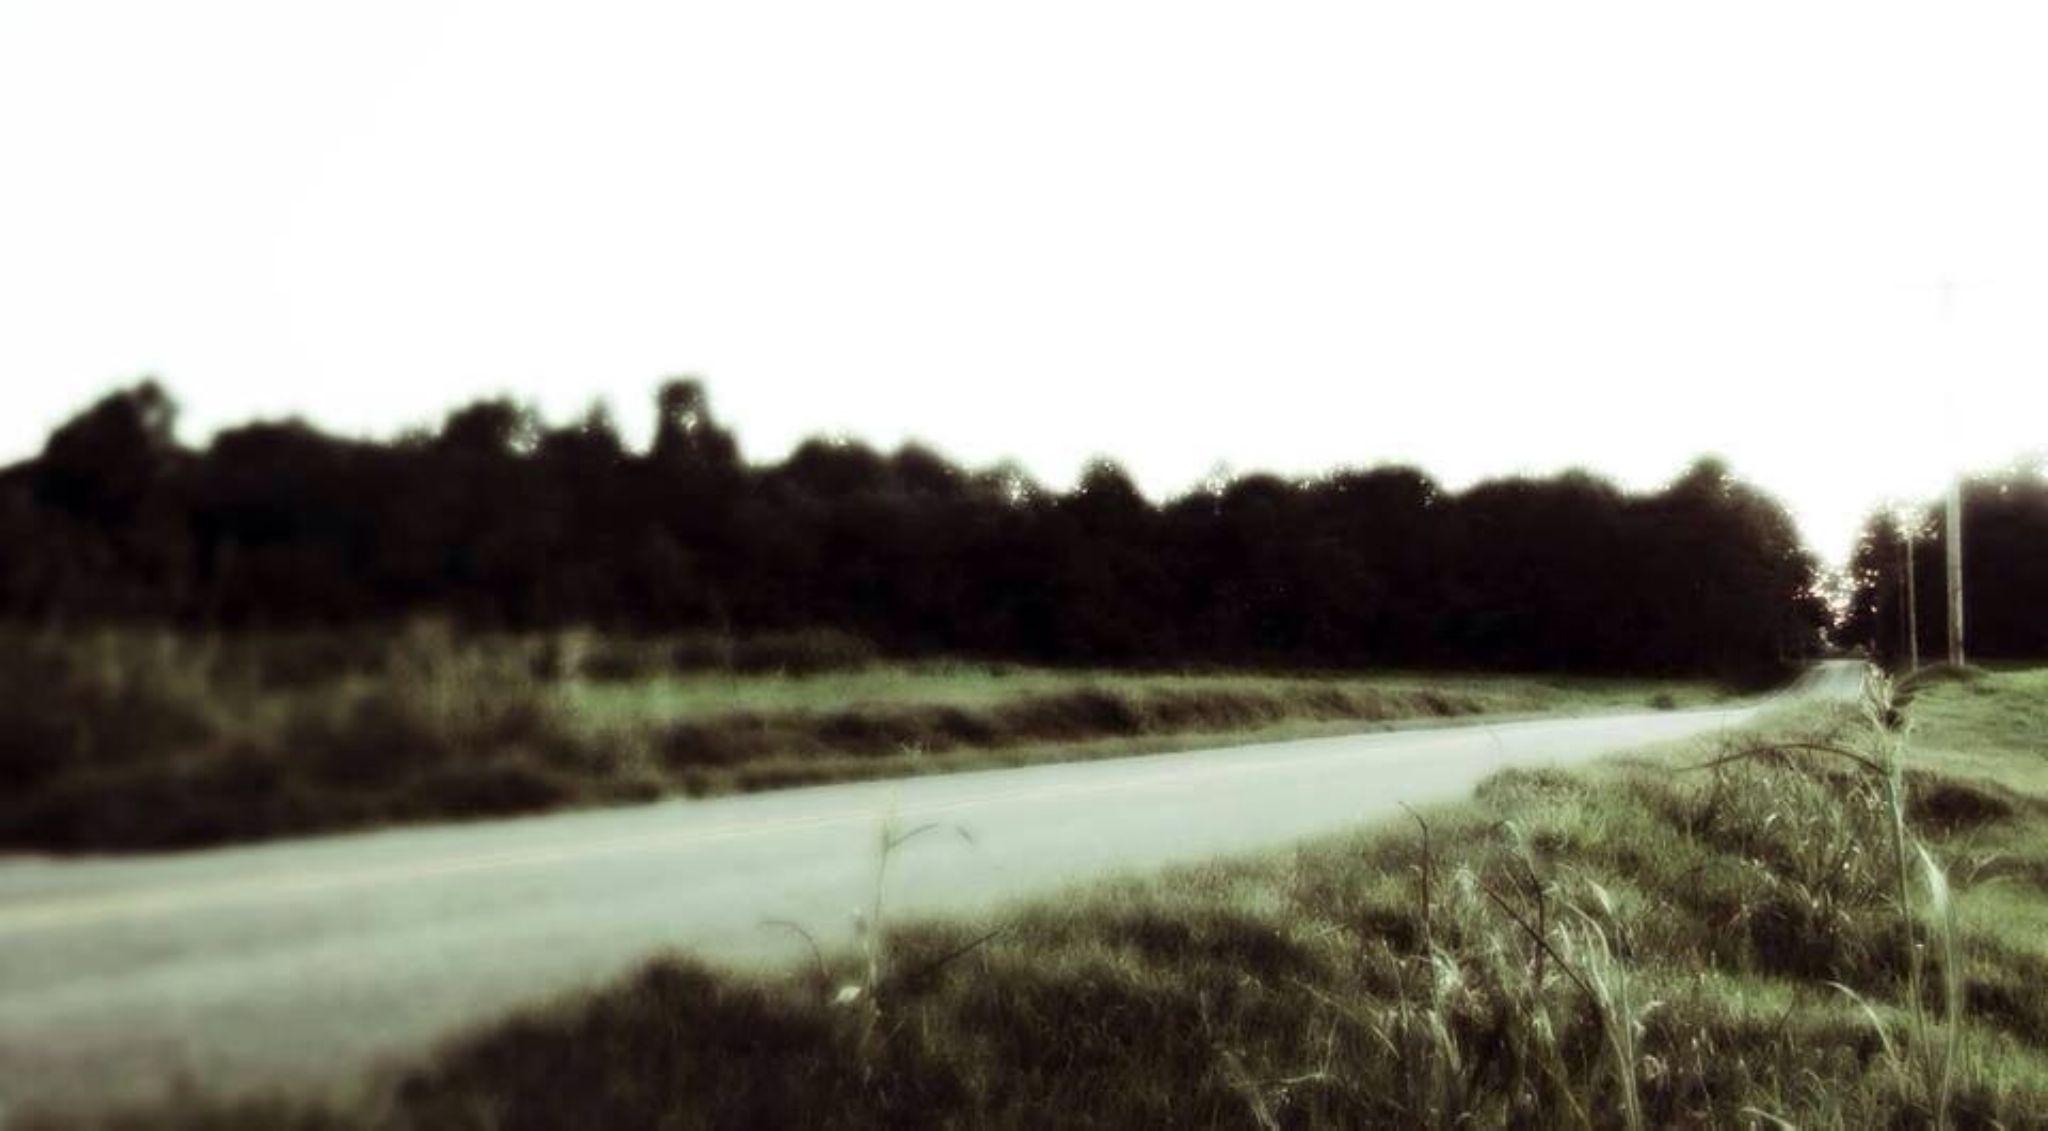 County Road by HolyMatt123